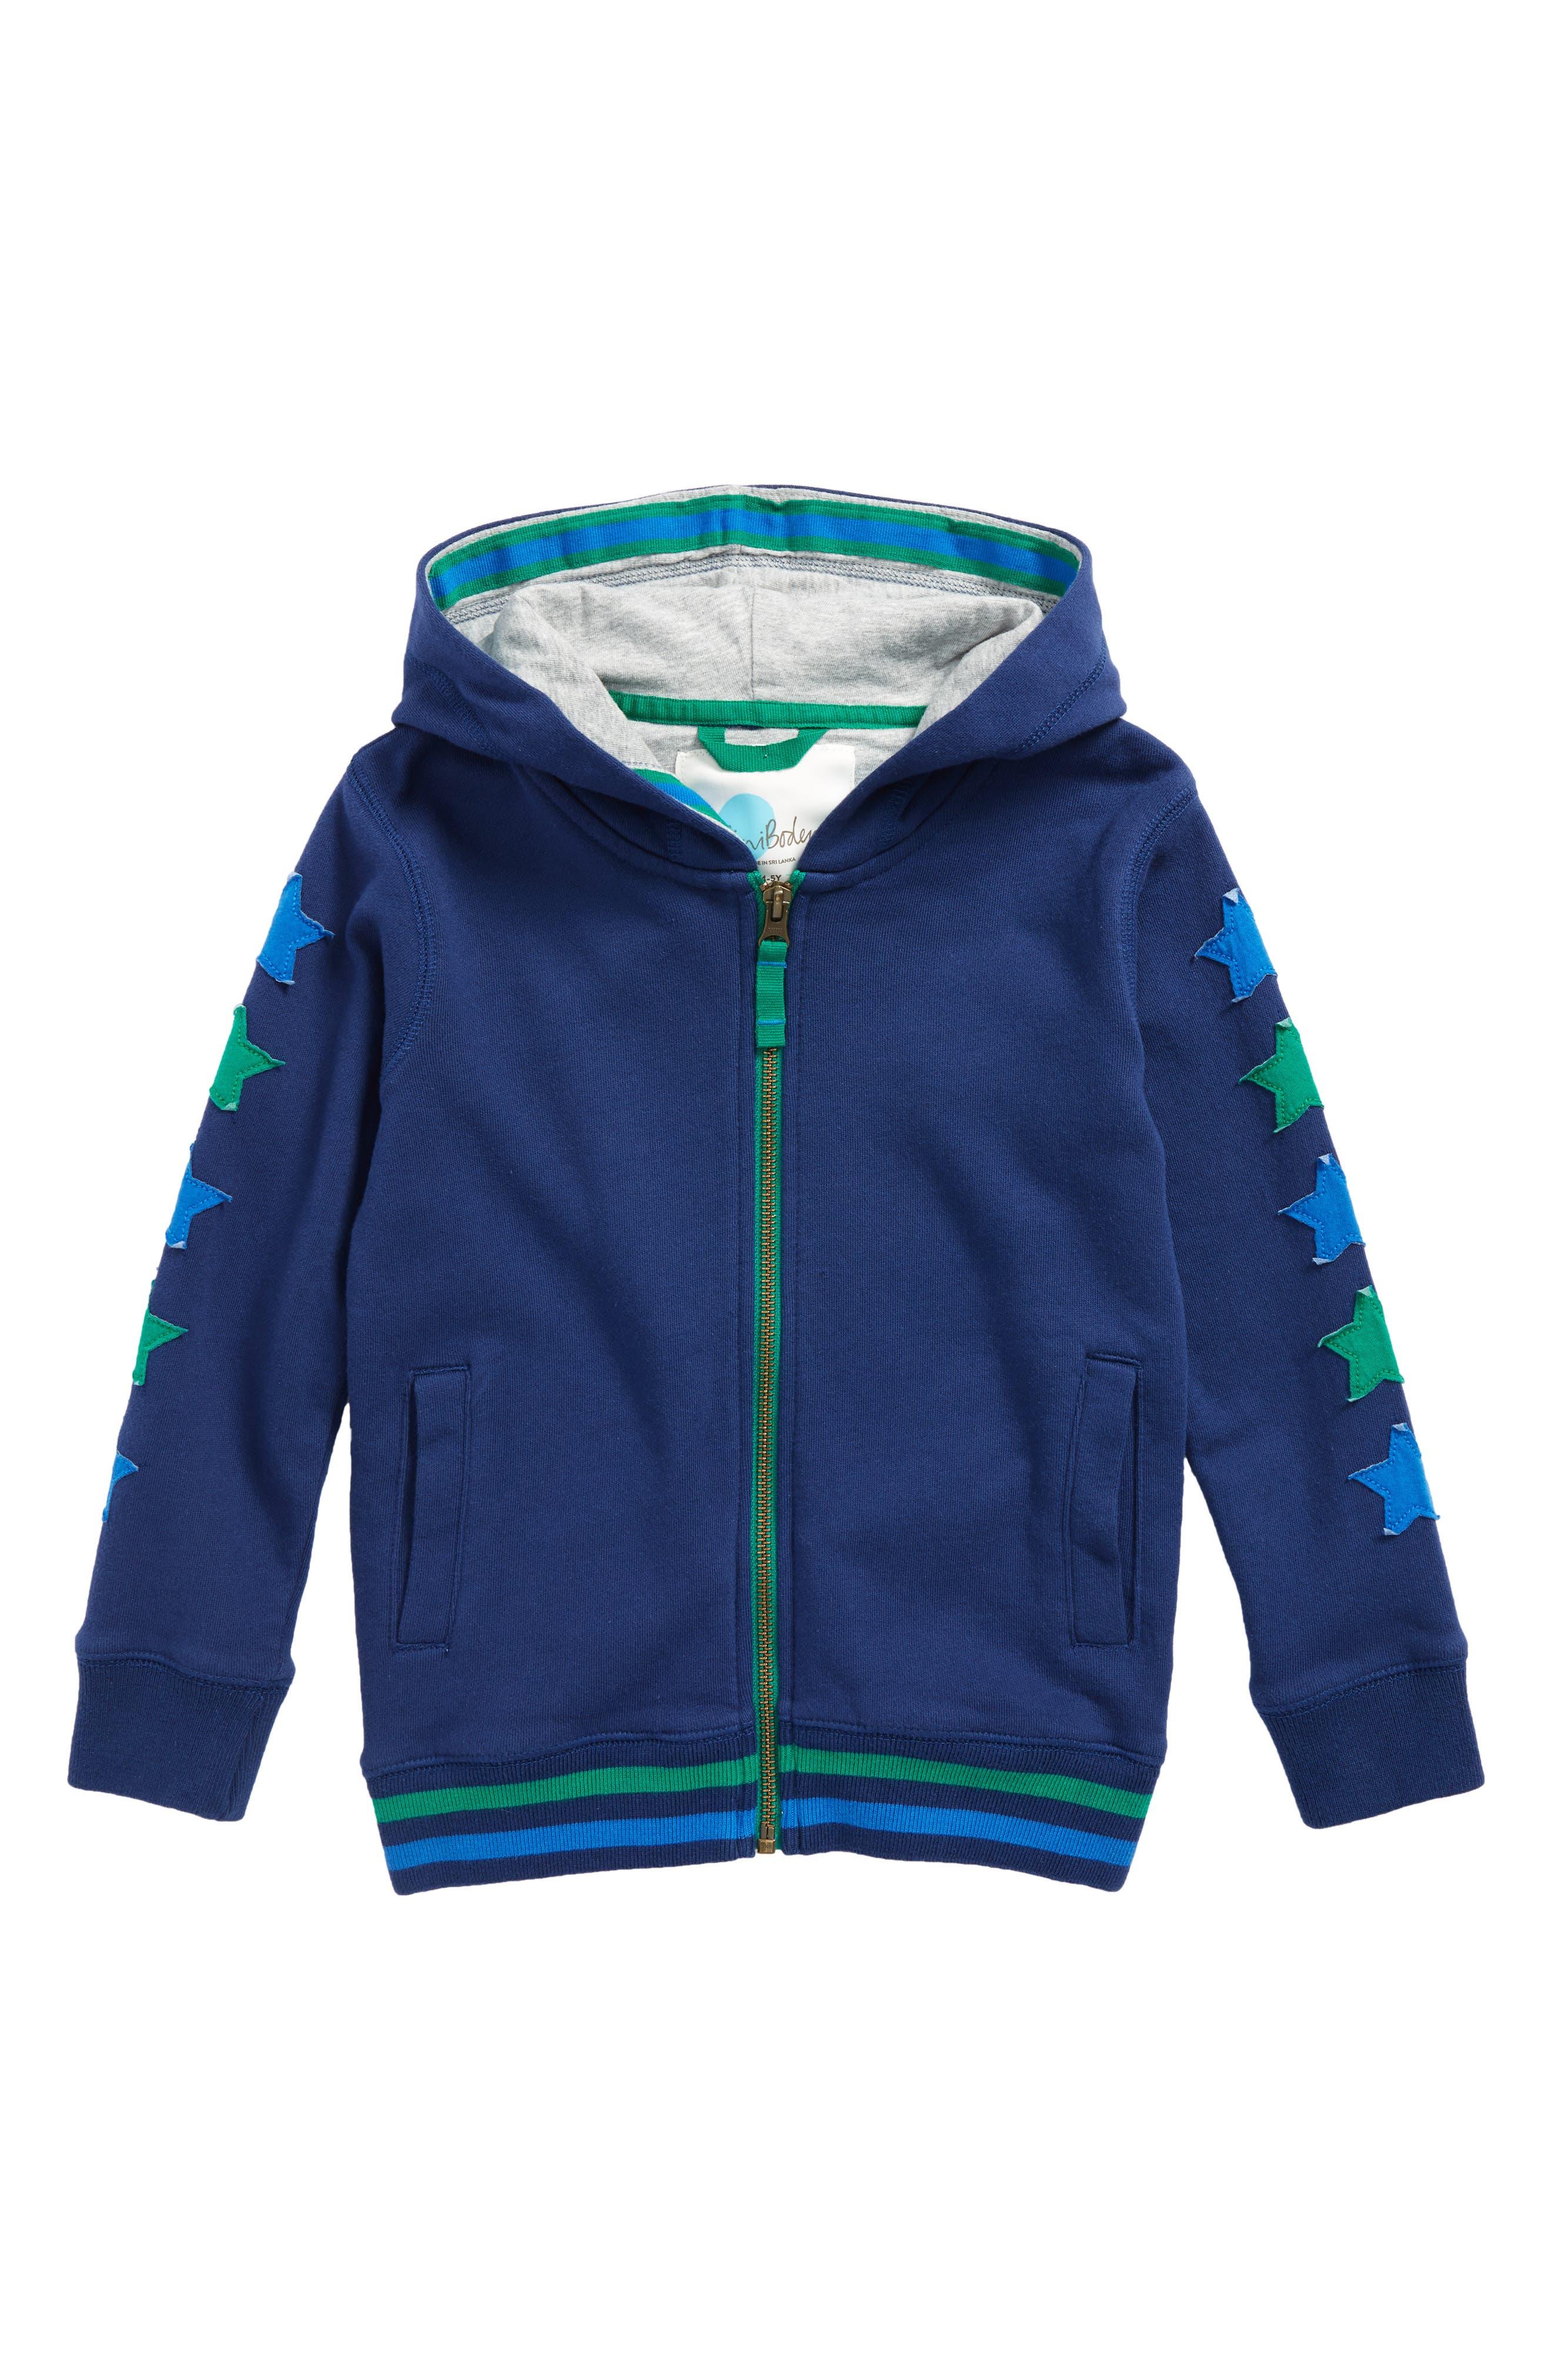 Starry Zip Hoodie,                         Main,                         color, Beacon Blue